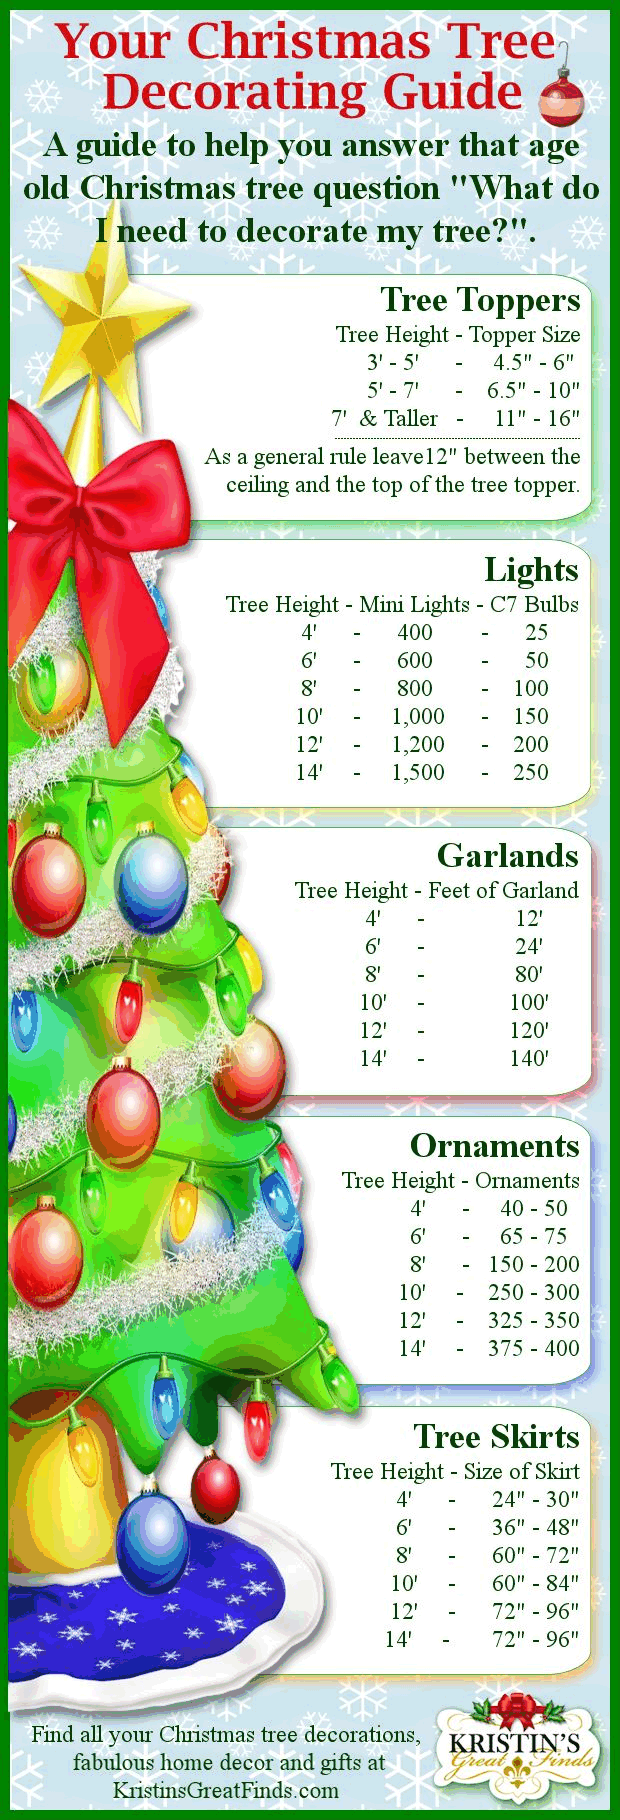 Christmas Tree Decorating Guide Diy Christmas Tree Christmas Tree Decorations Christmas Decorations